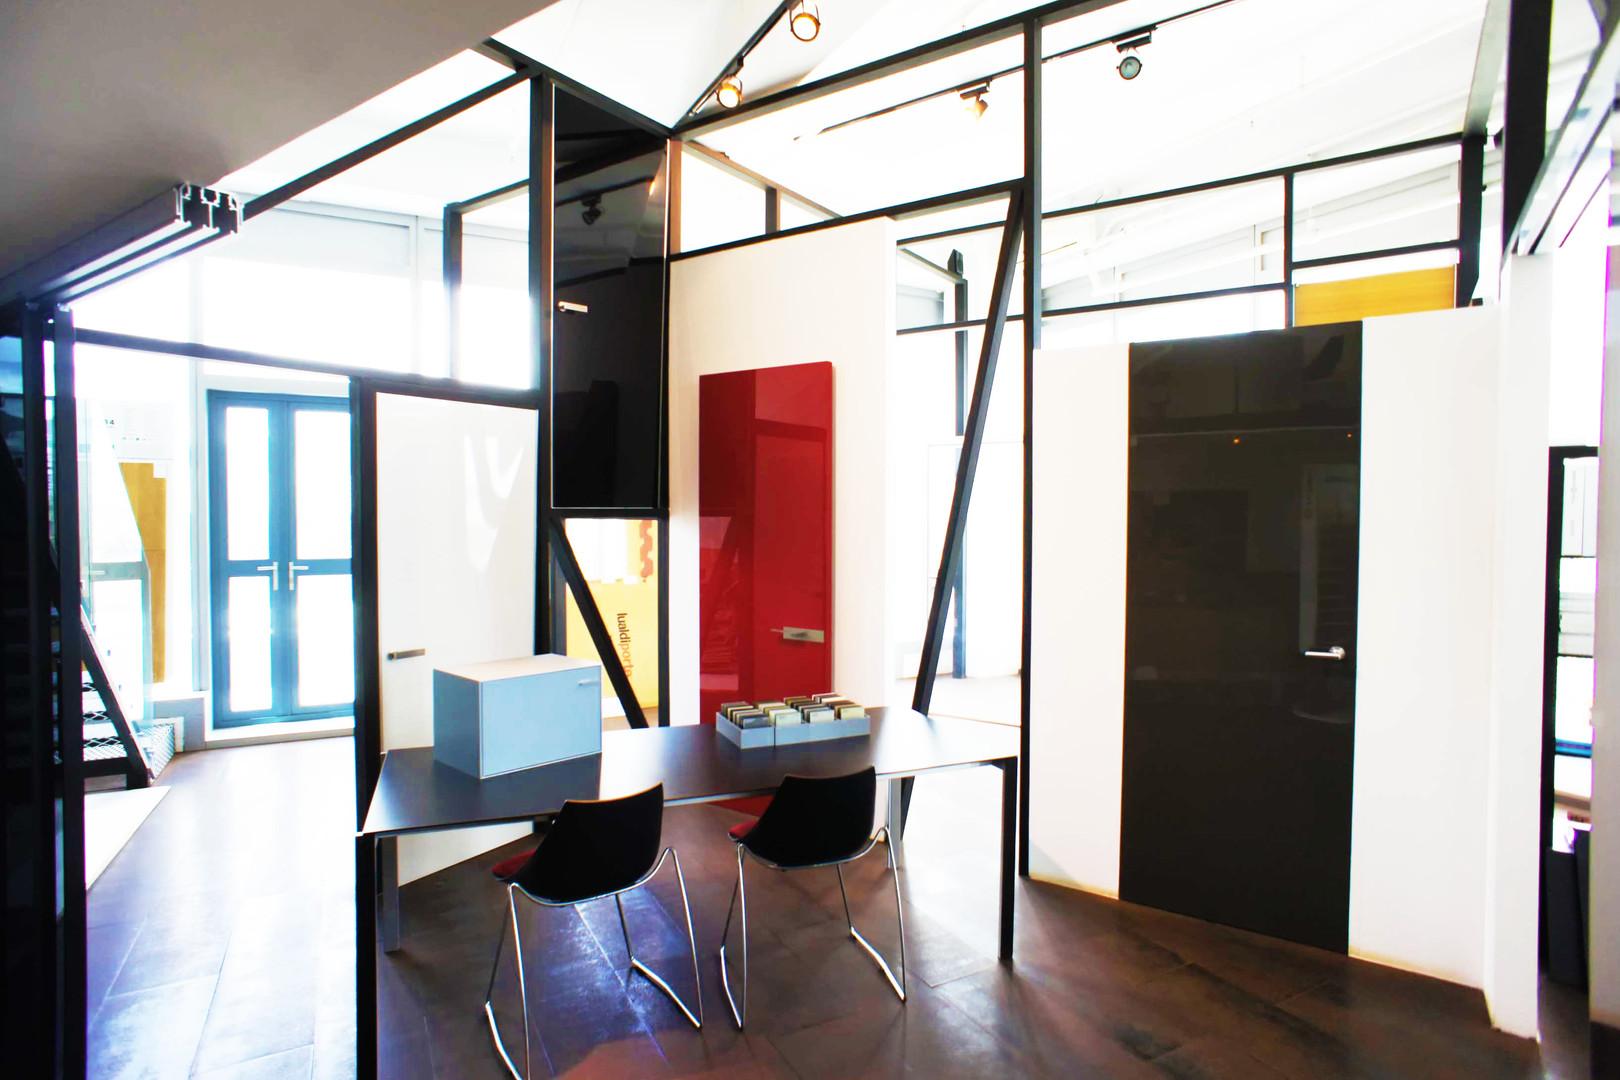 Porte+_室內設計_室內裝潢_商業空間設計_寫字樓裝修_室內設計示範_住宅別墅設計_提供Interior Design_客廳_睡房_浴室和廚房設計_訂造傢俬1.JPG